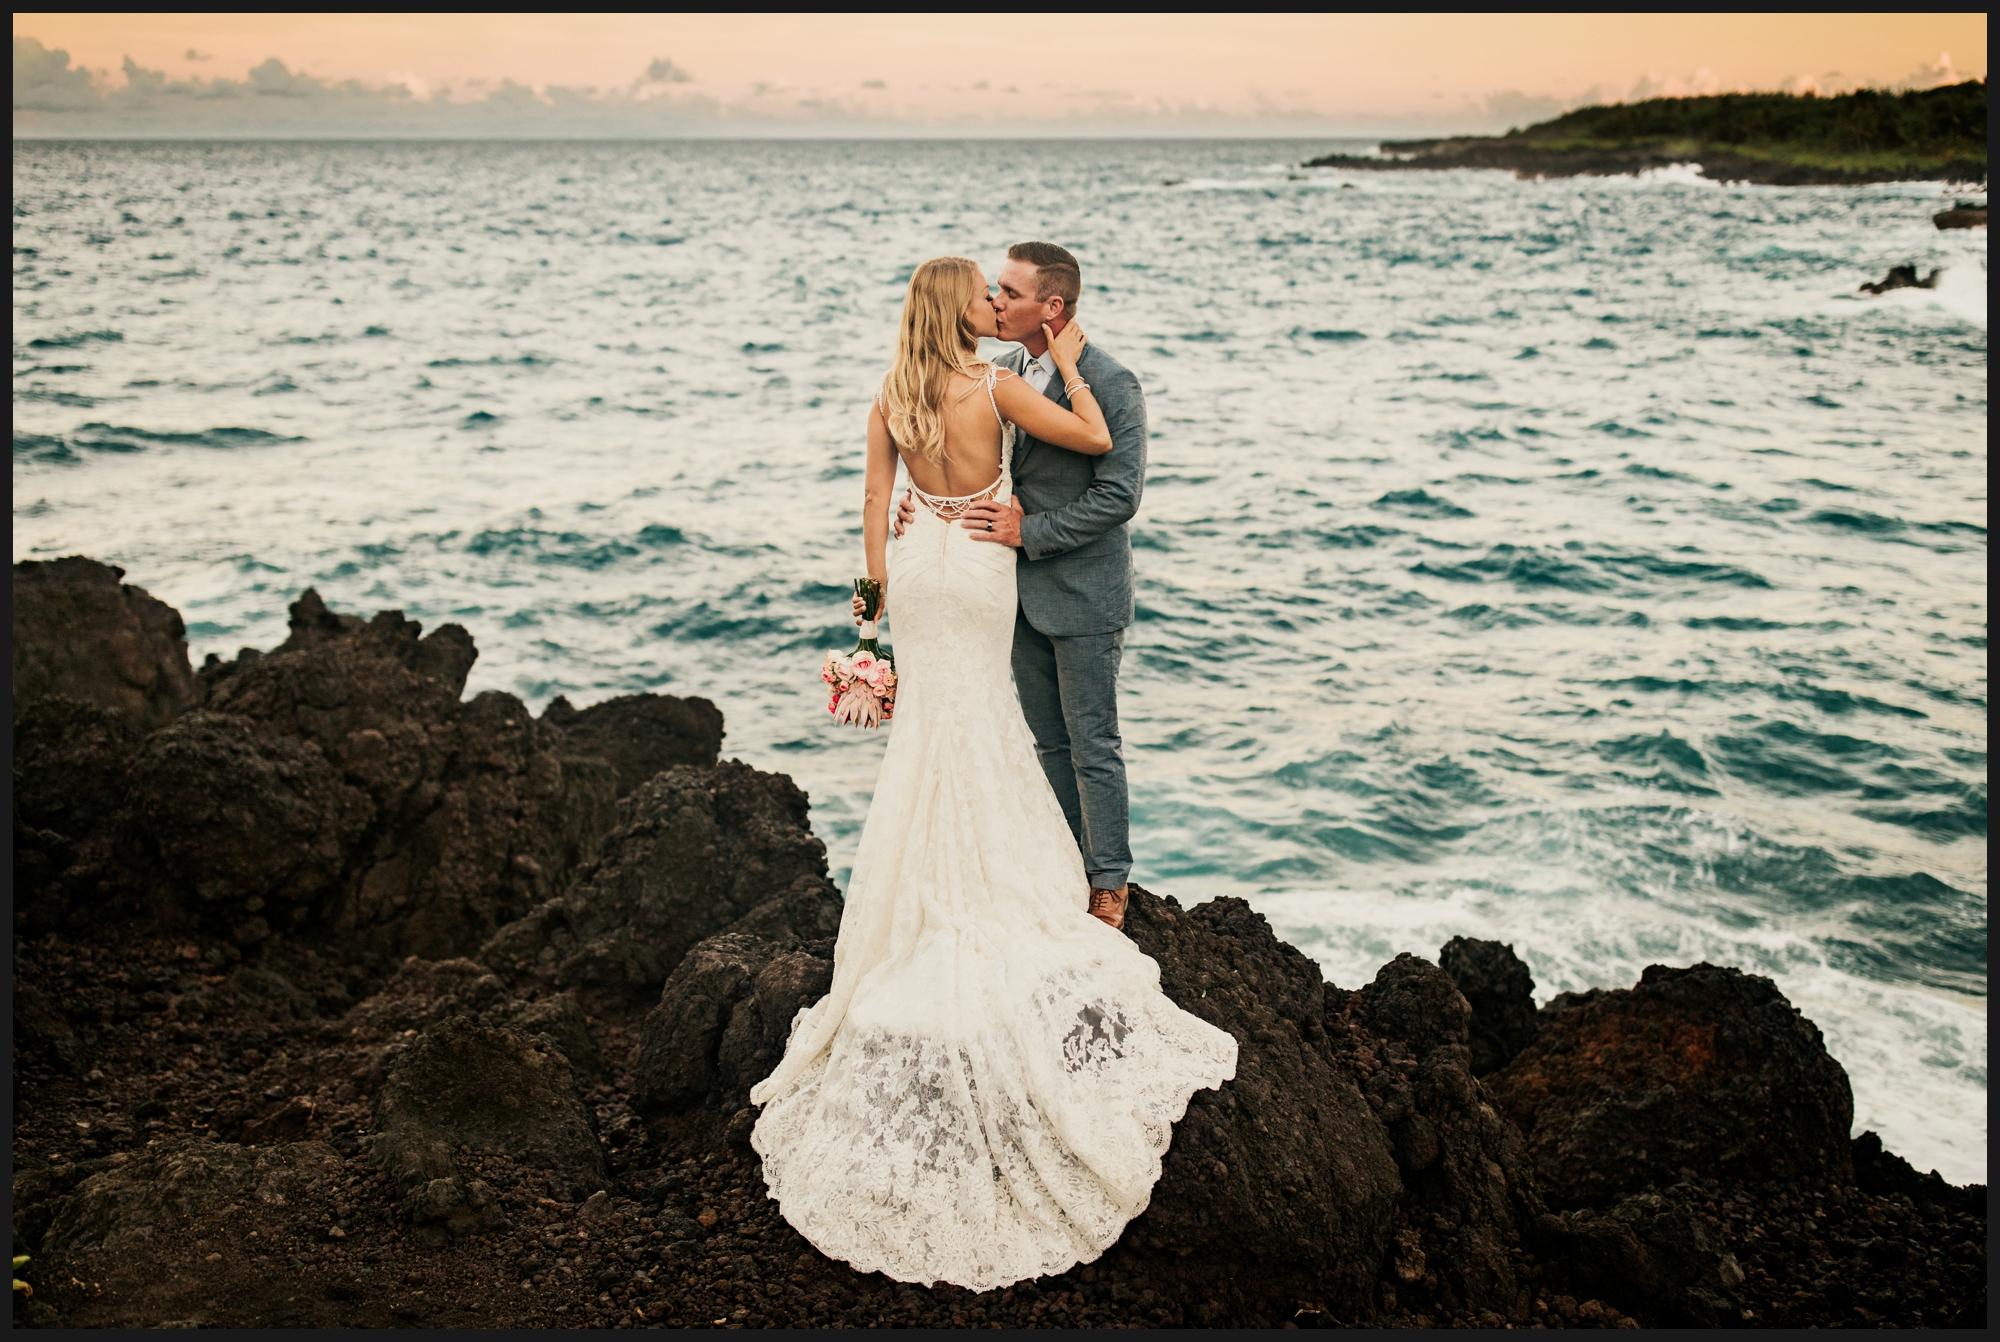 Orlando-Wedding-Photographer-destination-wedding-photographer-florida-wedding-photographer-hawaii-wedding-photographer_0026.jpg